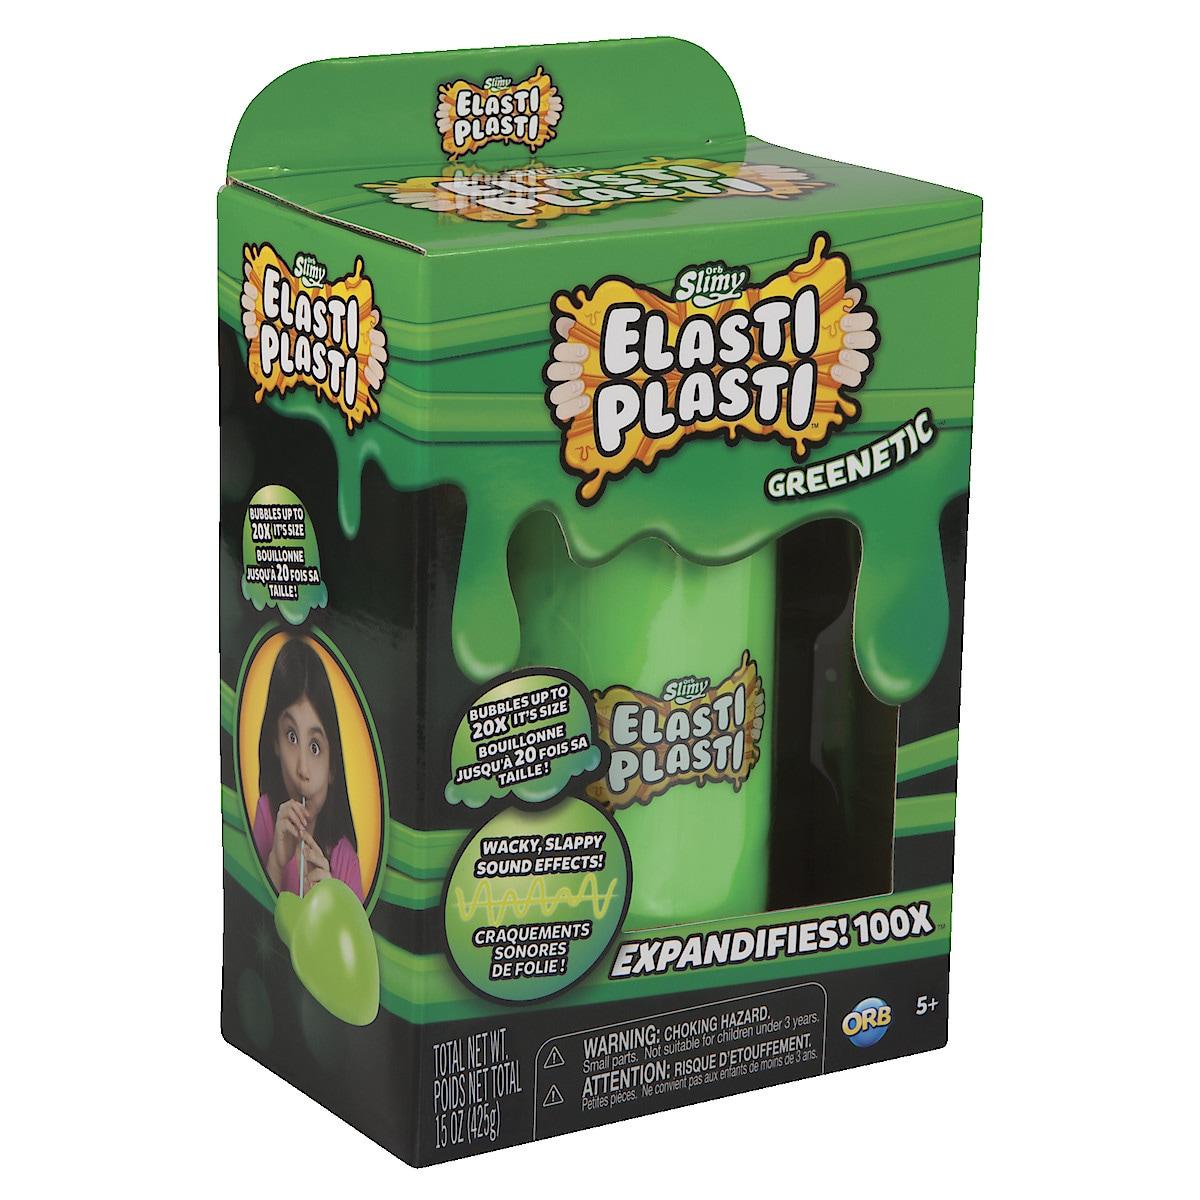 Elastiskt slime Elasti Plasti